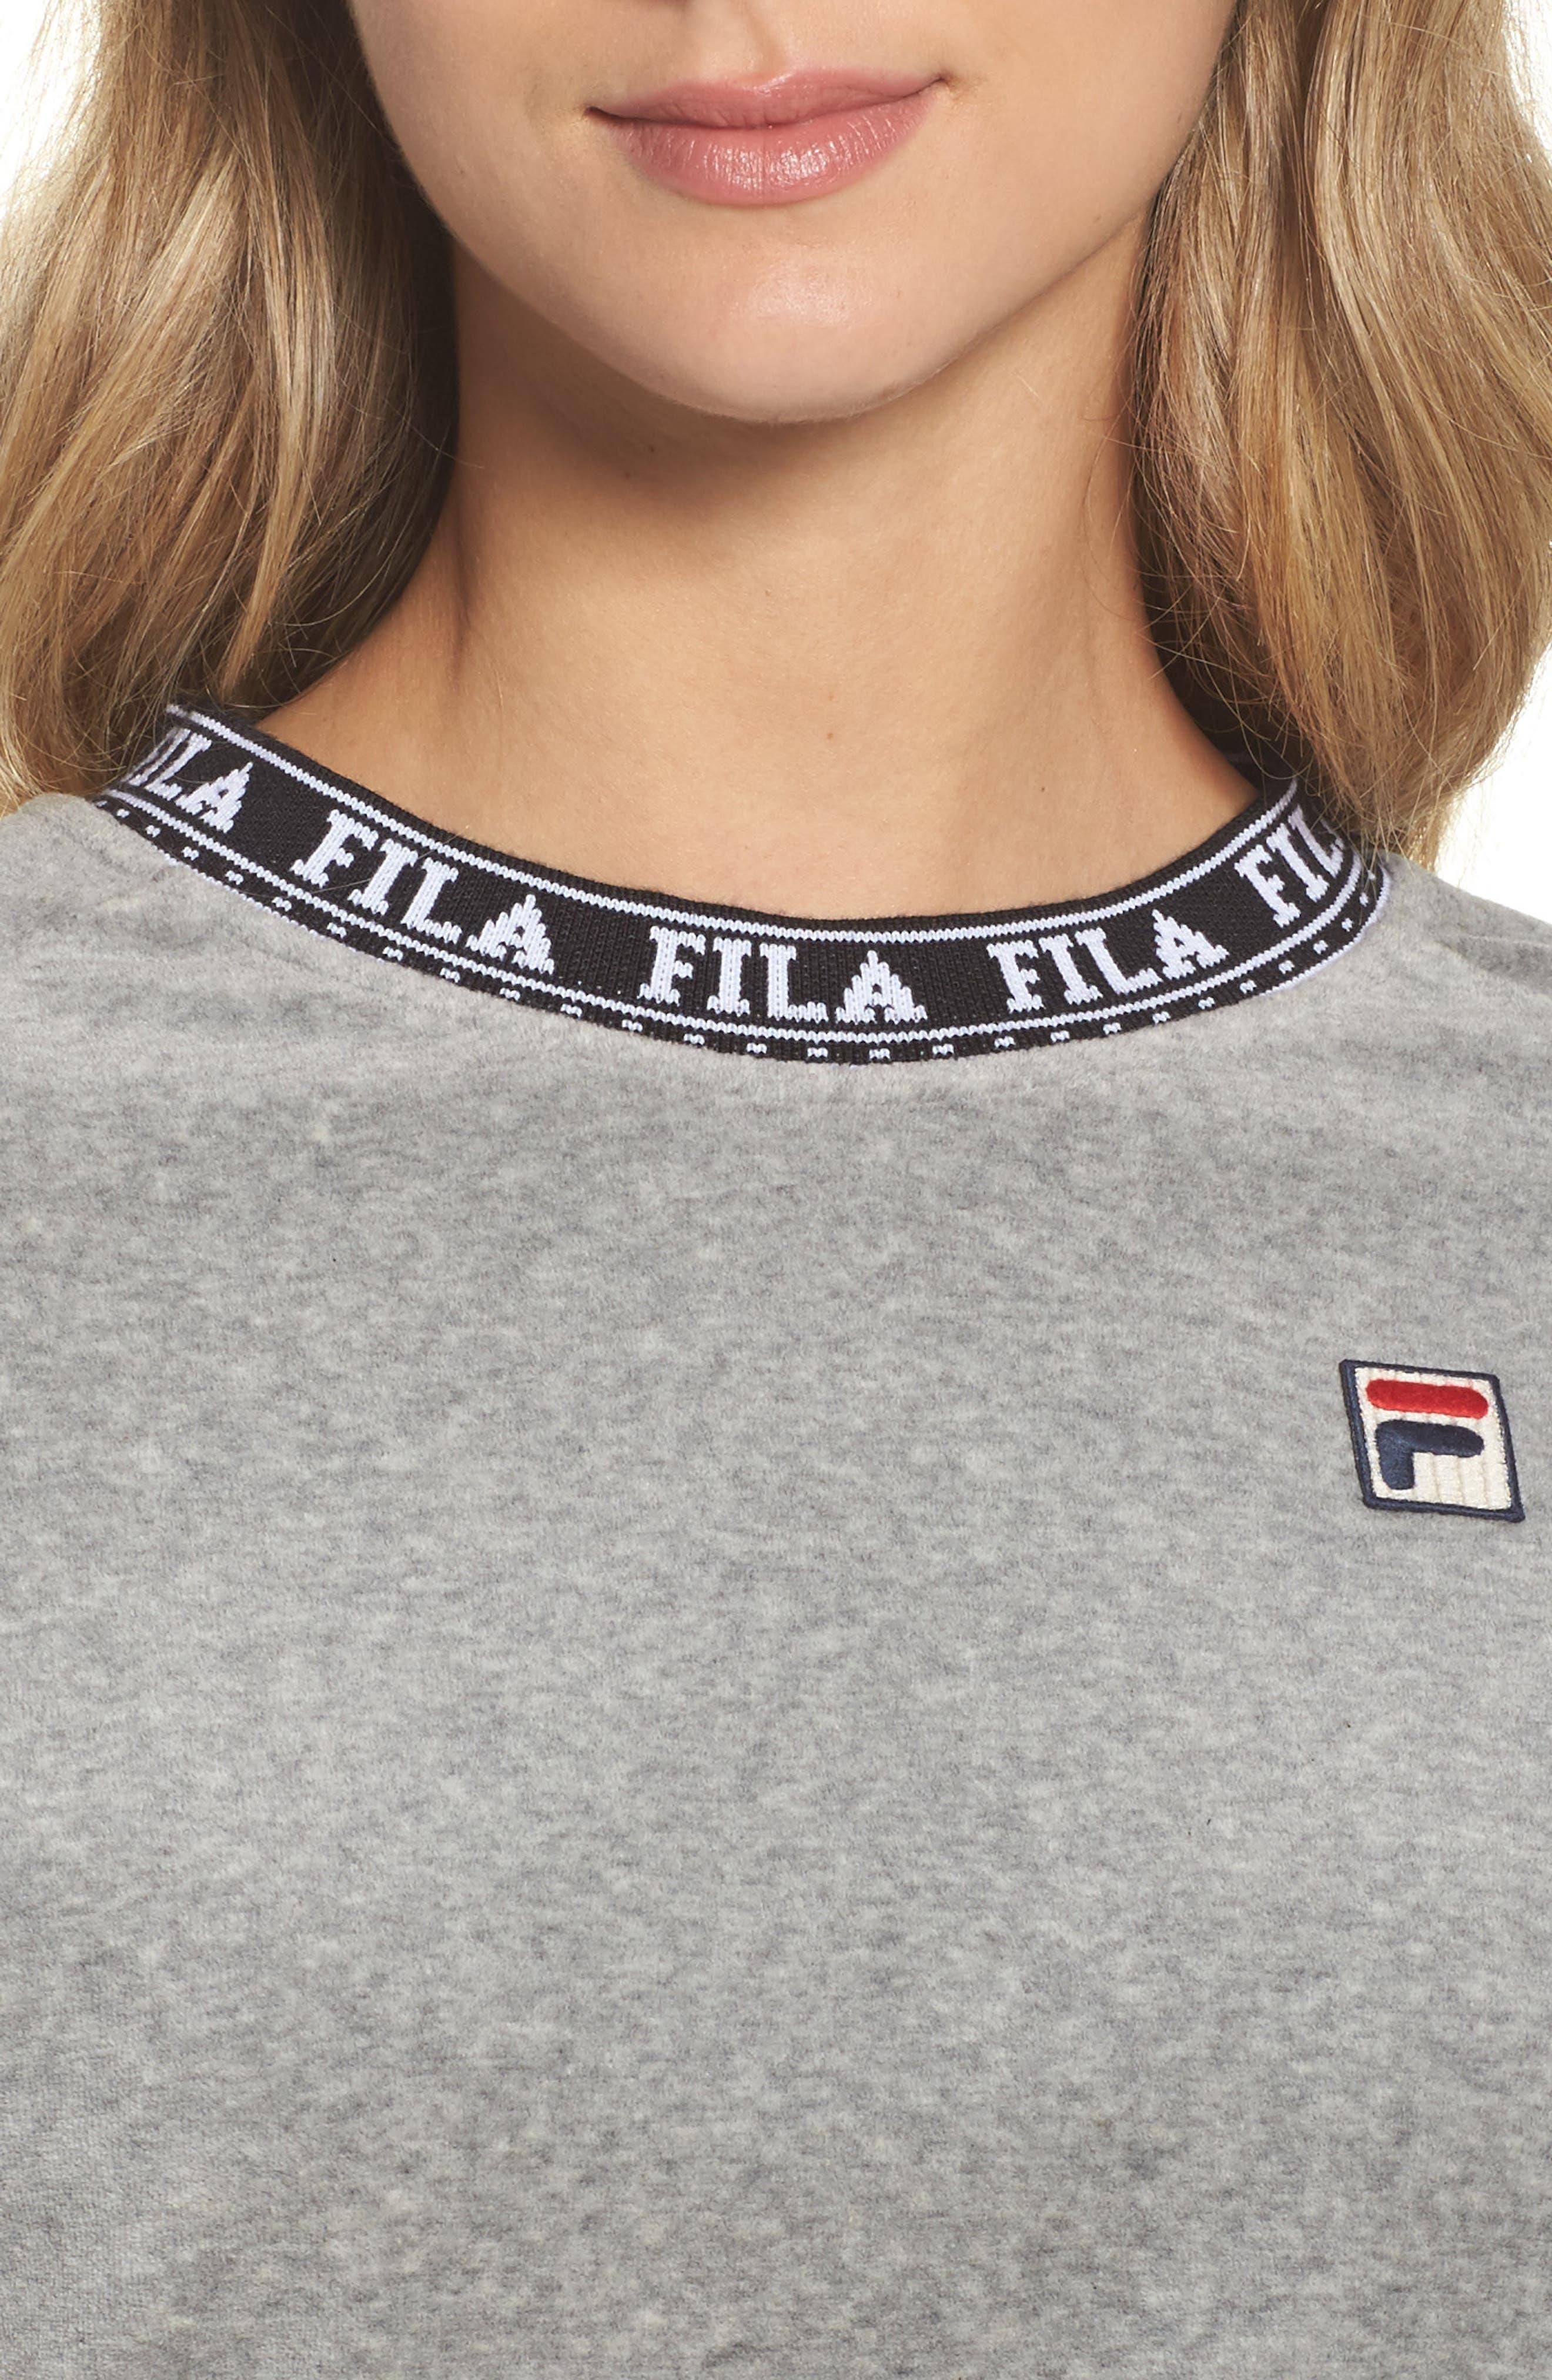 Dina Velour Crop Sweatshirt,                             Alternate thumbnail 4, color,                             Grey Heather/ Black/ White